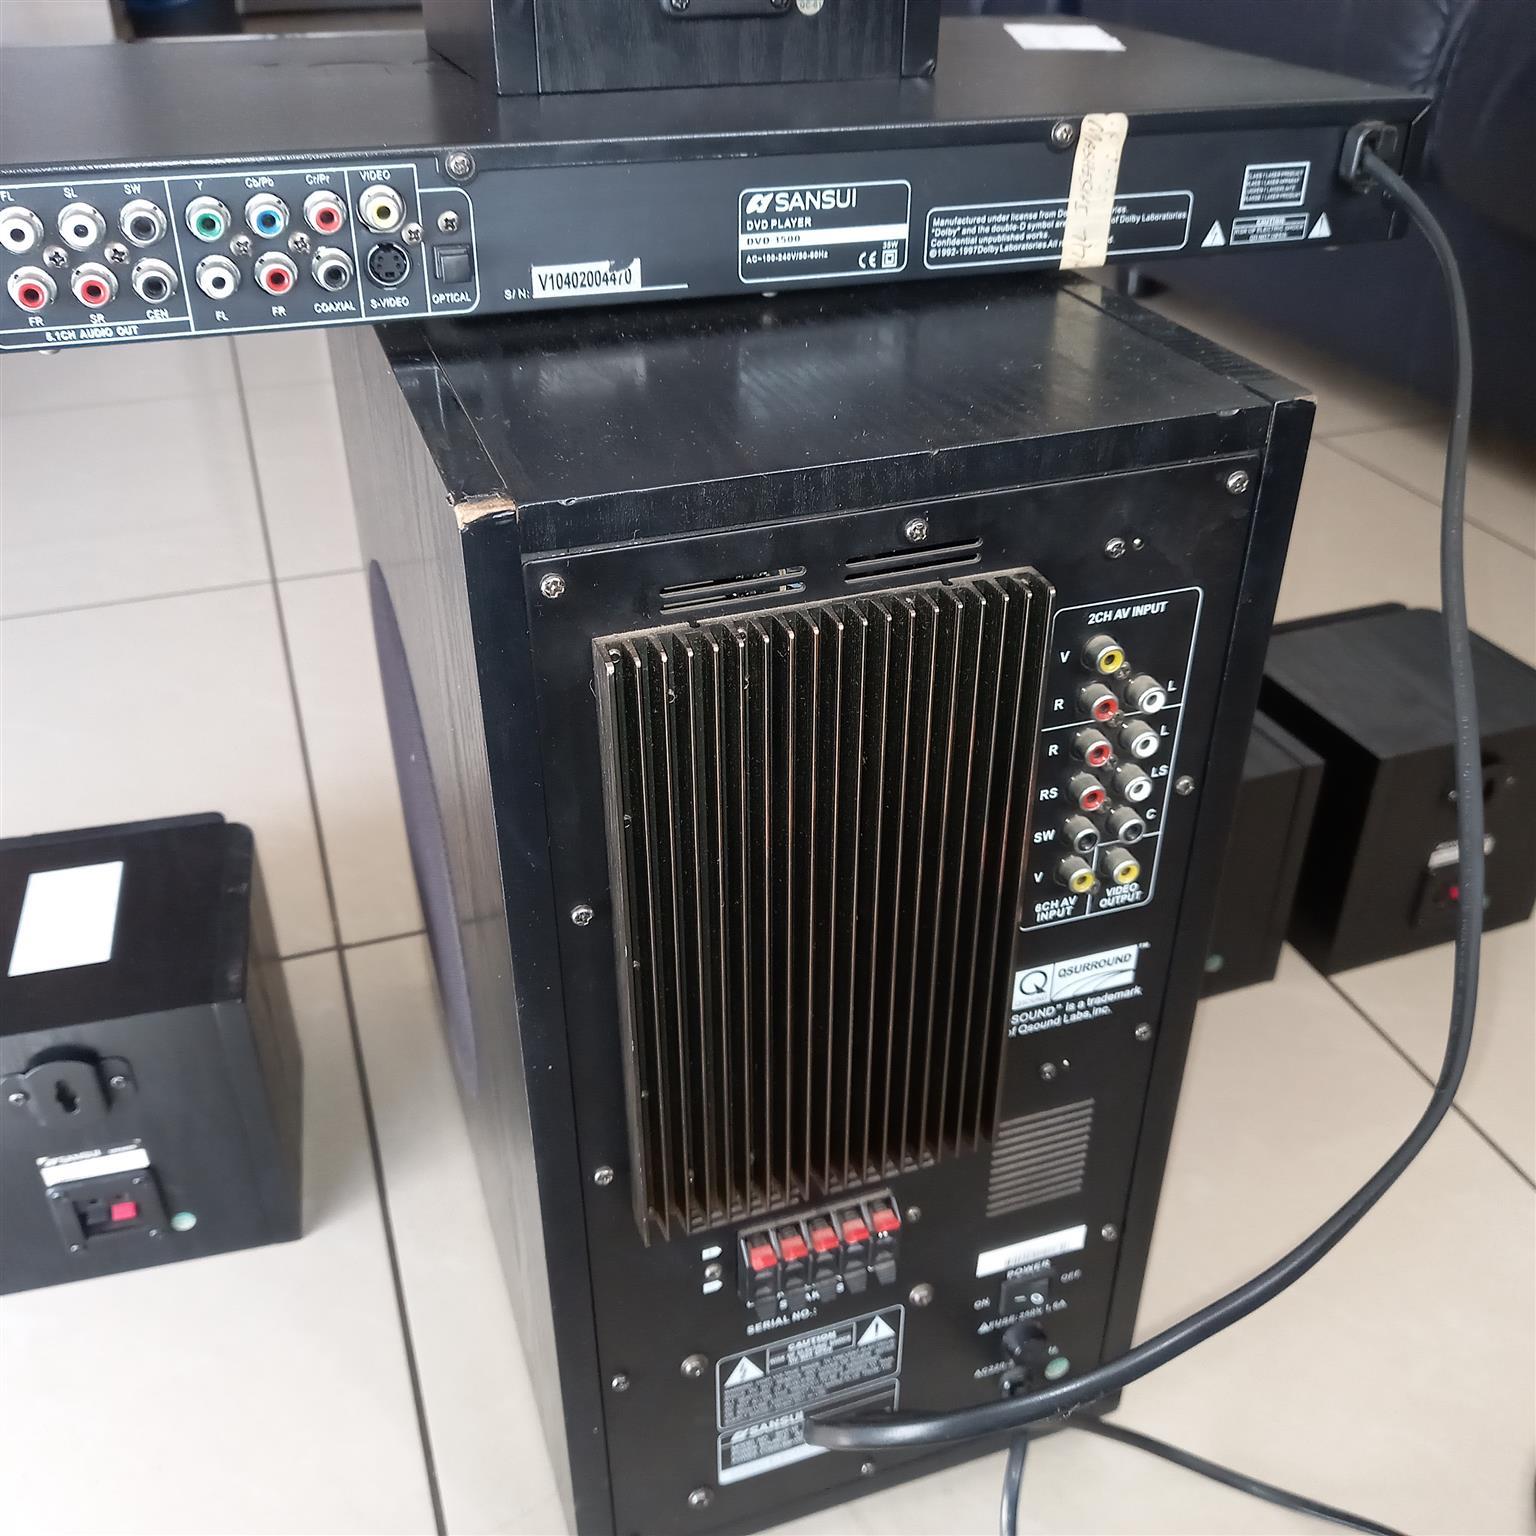 Sansui surround sound system